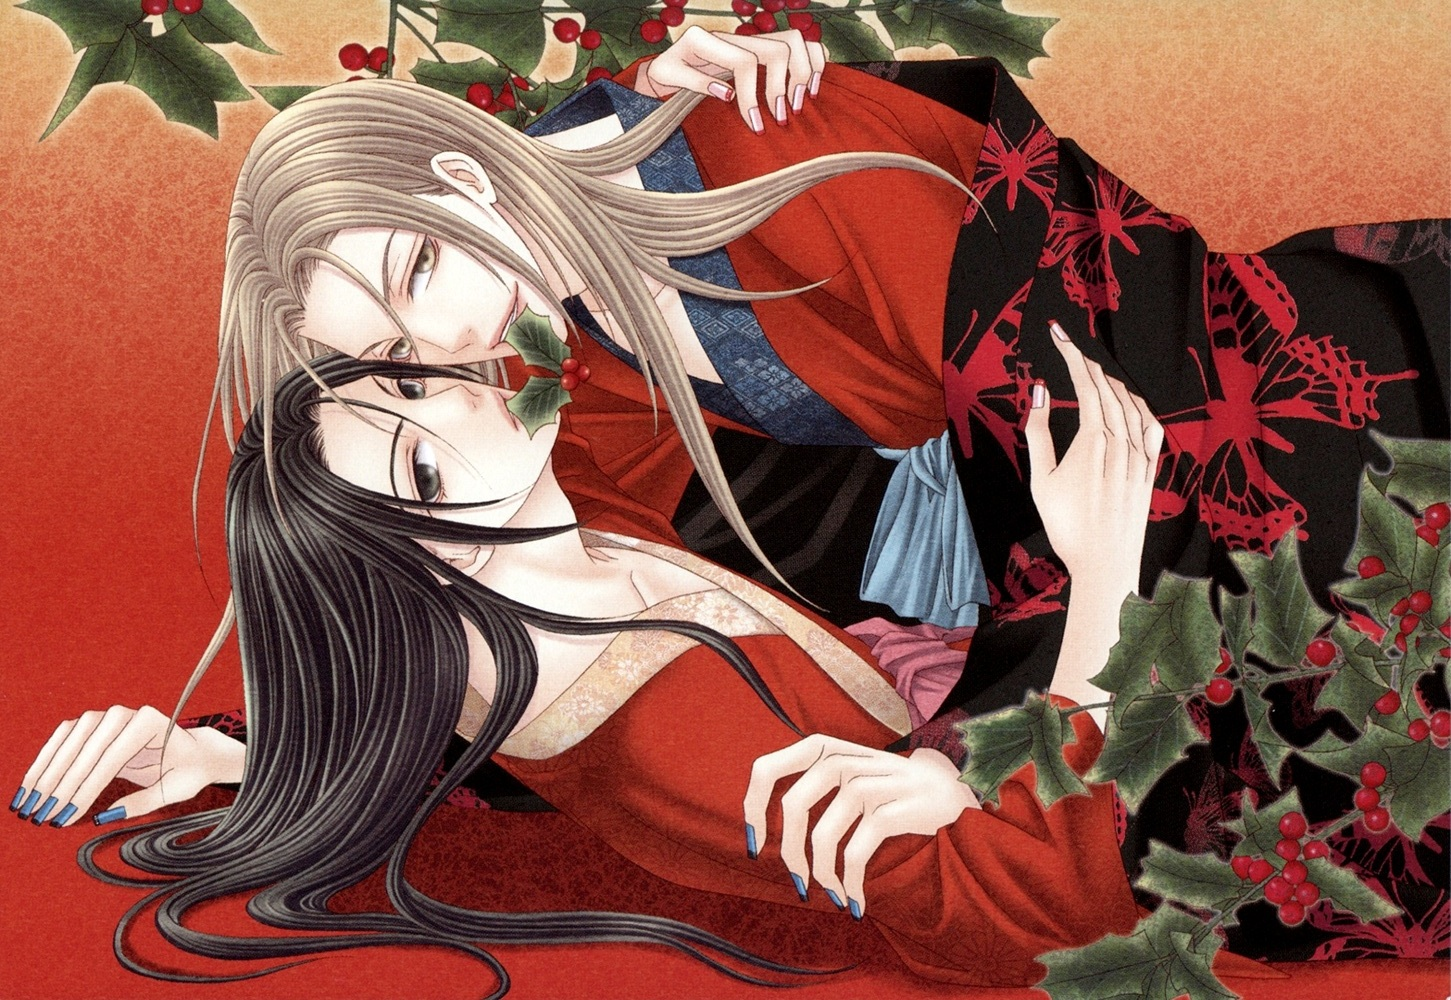 Kimono Boys Manga Itsuki Kaname Zerochan Anime Image